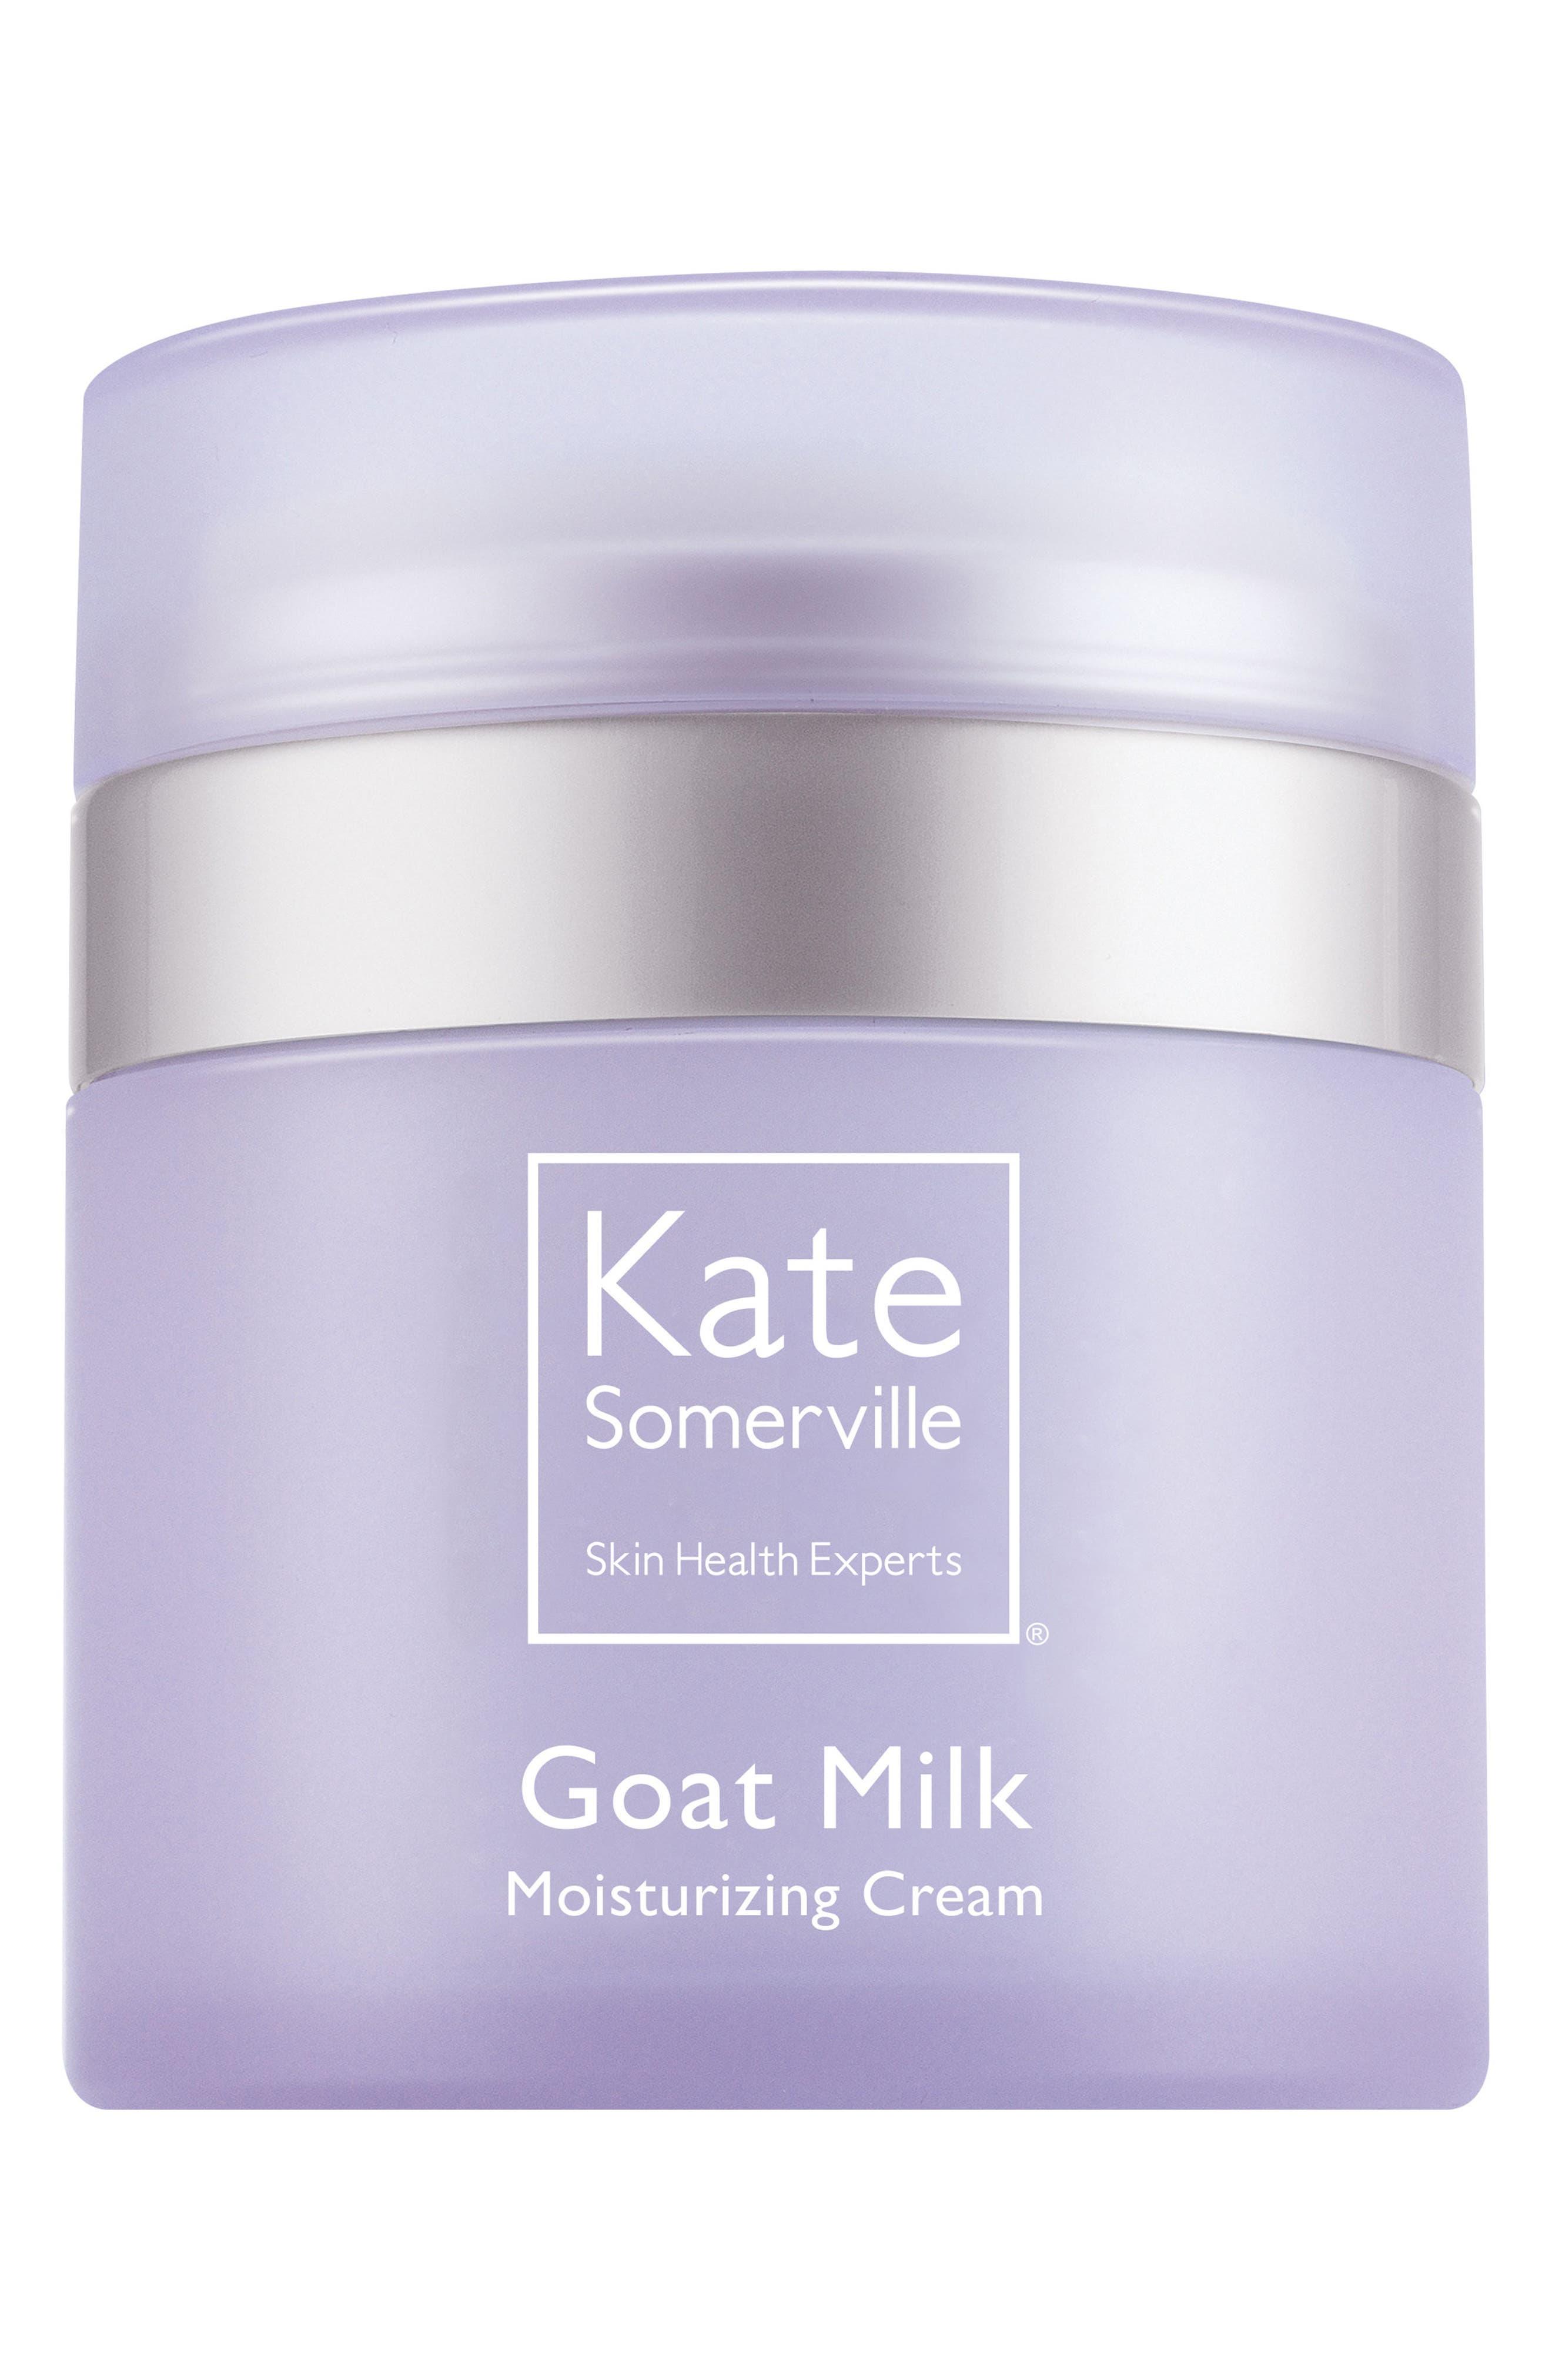 KATE SOMERVILLE® Goat Milk Moisturizing Cream